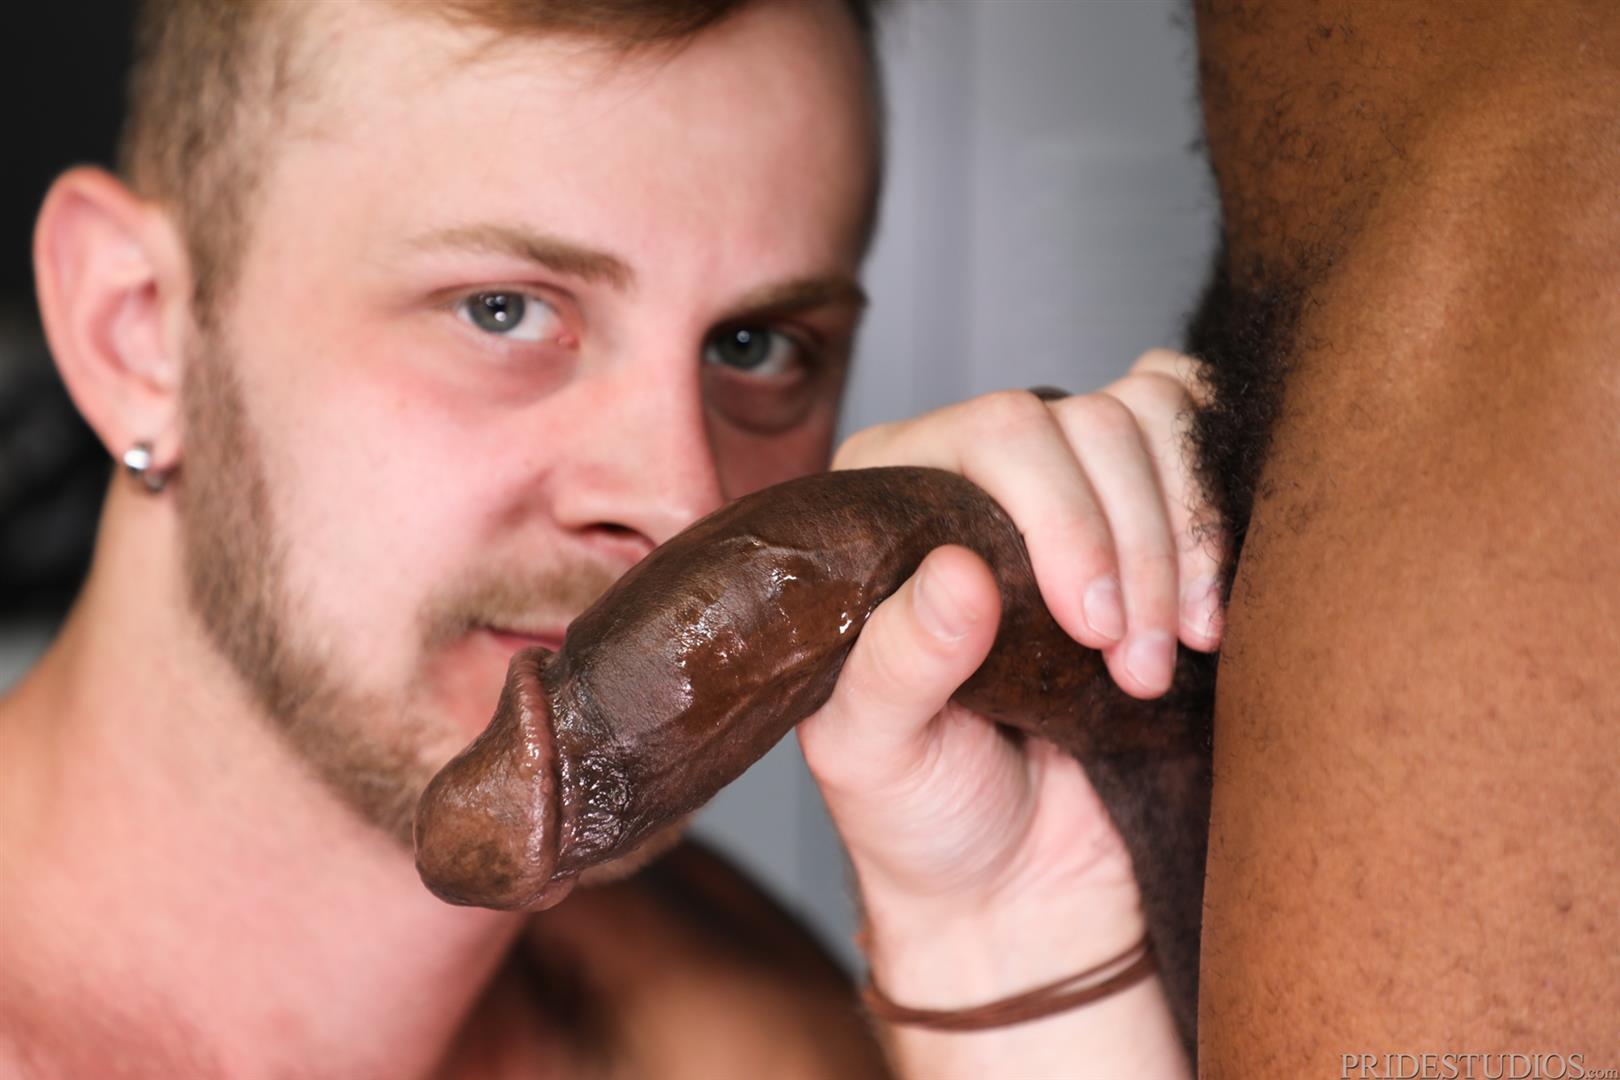 Extra-Big-Dicks-Osiris-Blade-and-Chandler-Scott-Interracial-Bareback-Fucking-04 Osiris Blade Bareback Fucking Chandler Scott With His Big Black Dick